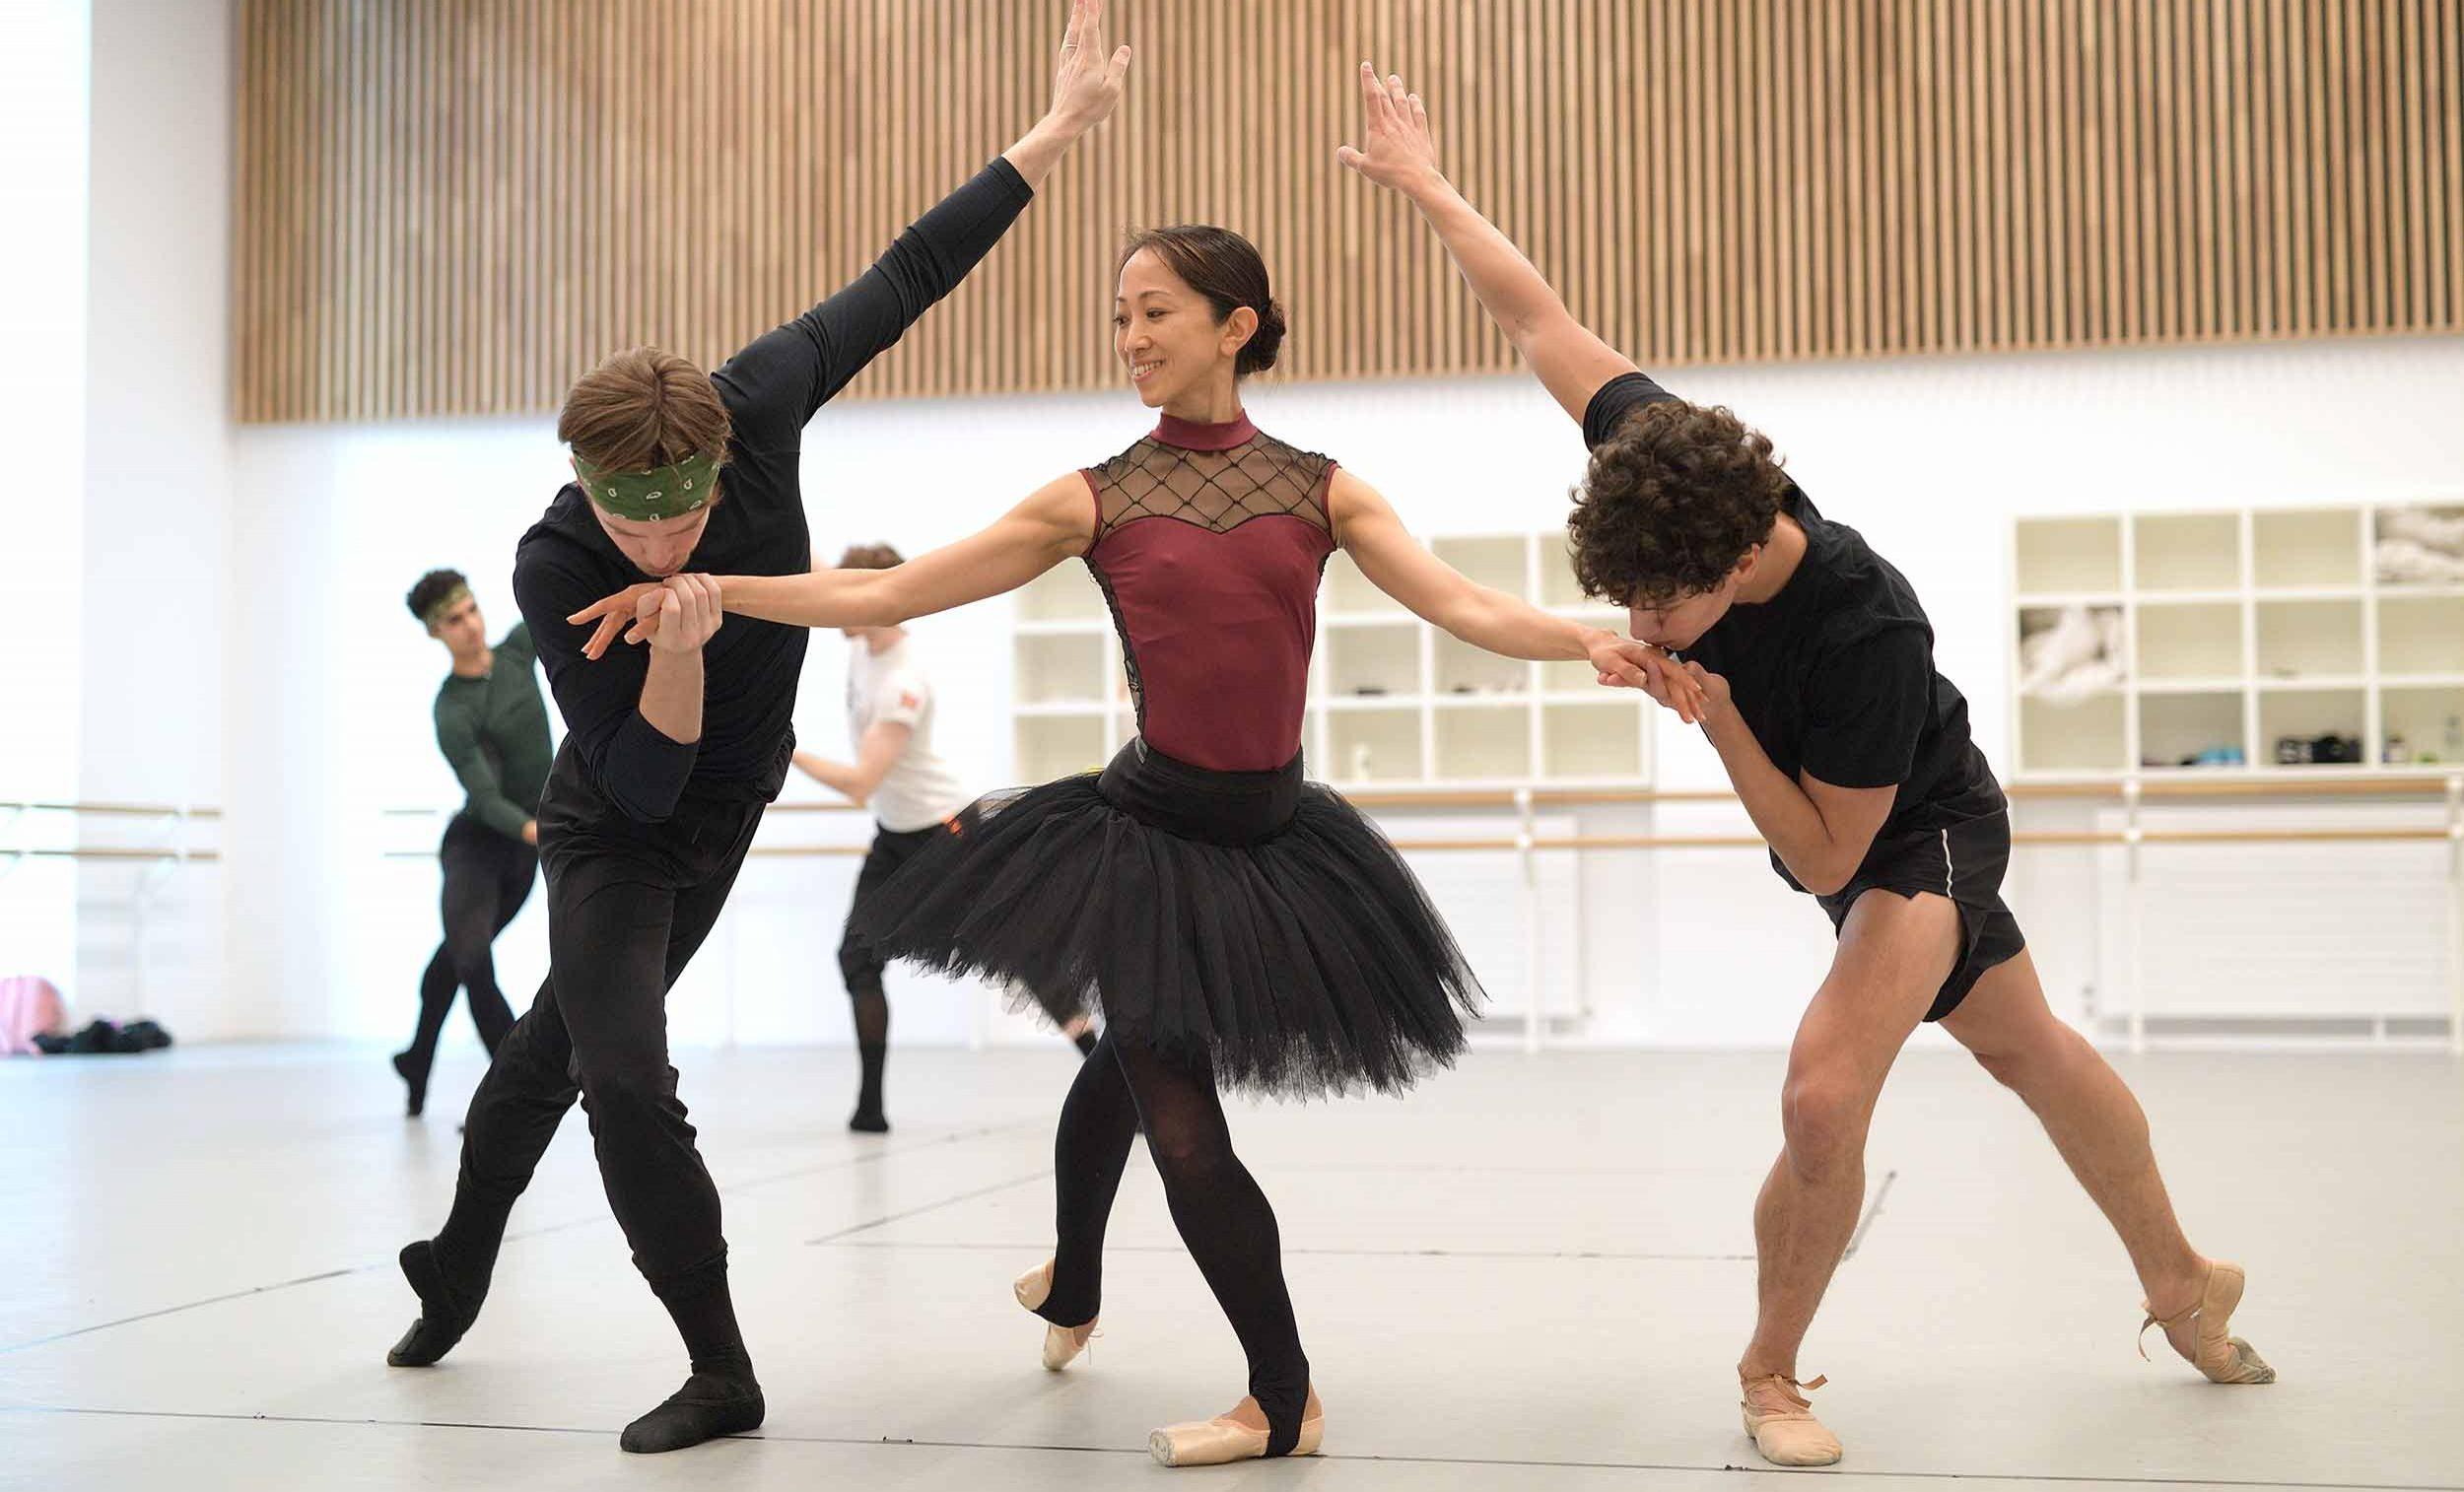 Joseph-Caley,-Erina-Takahshi-and-Isaac-Hernandez-rehearse-Etudes-English-National-Ballet's-70th-Anniversary-Gala-(c)-Laurent-Liotardo